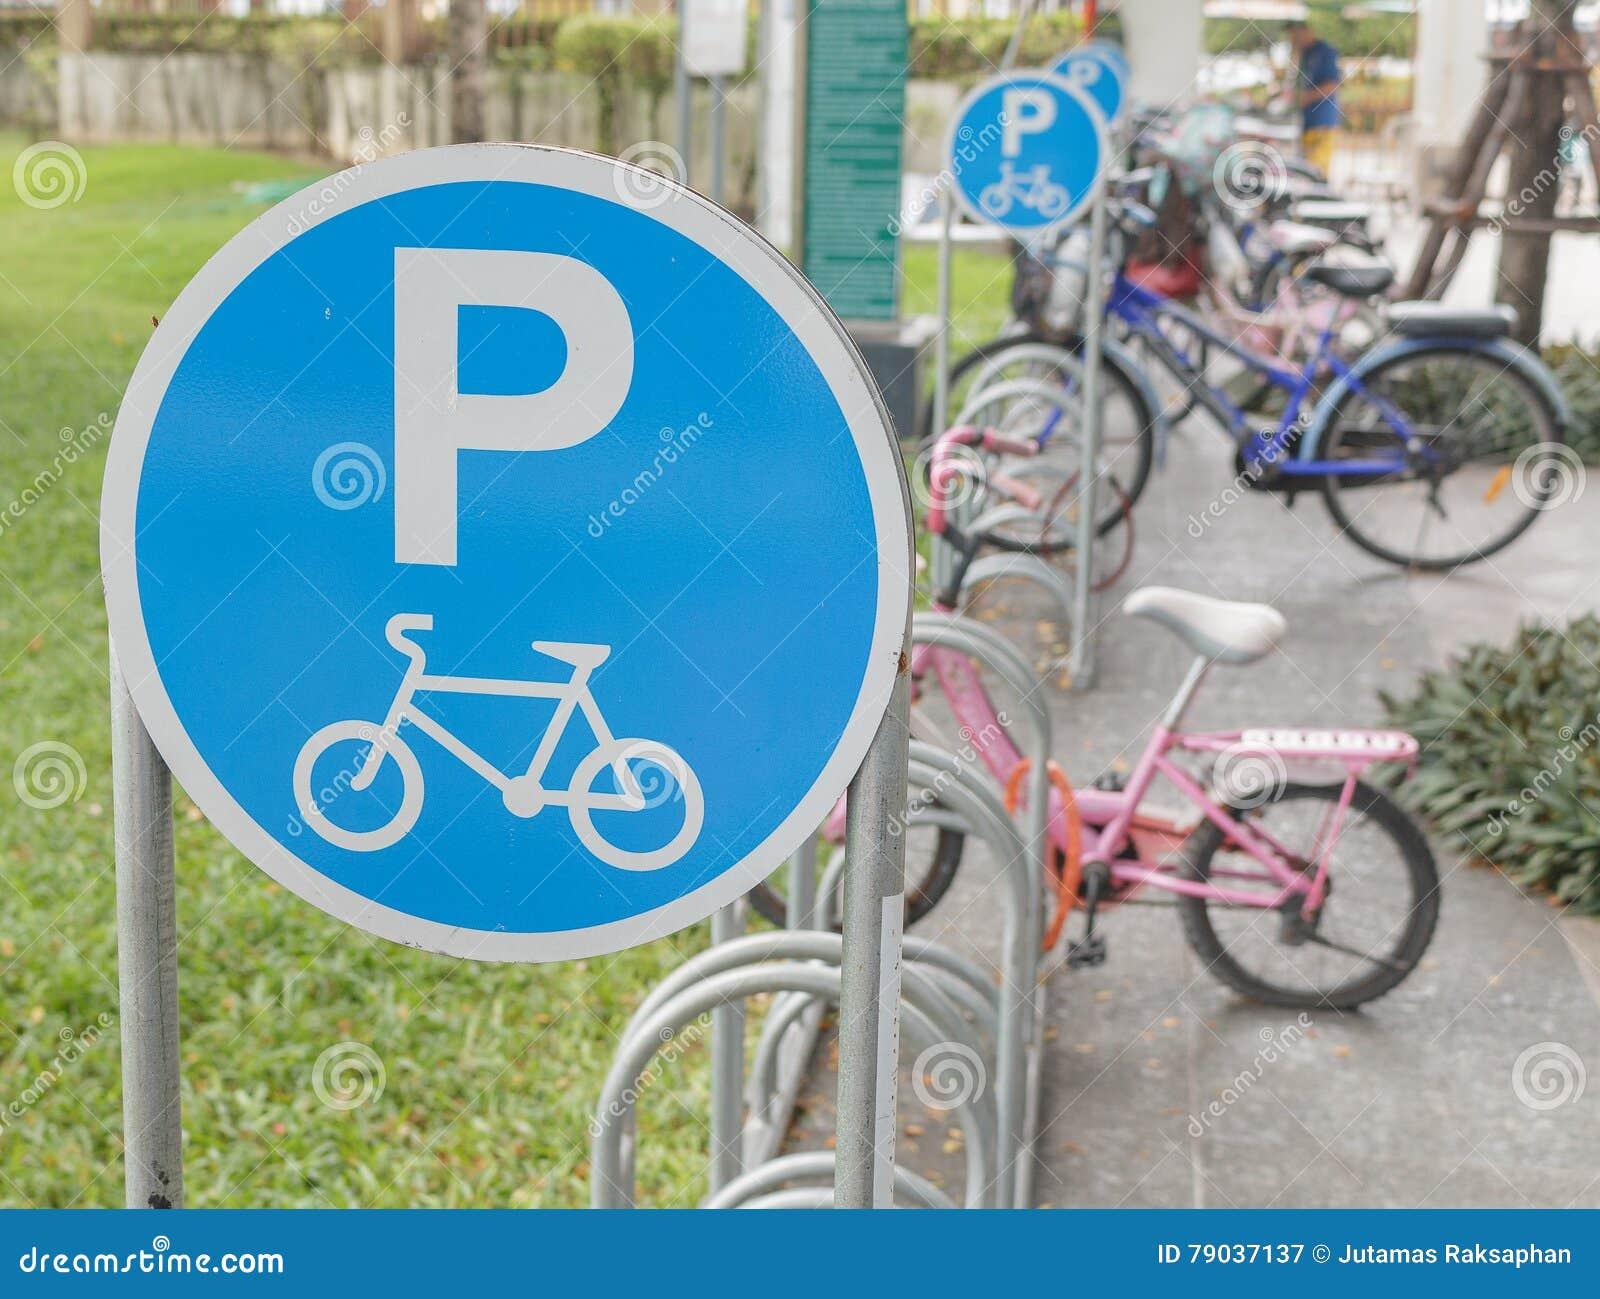 Symbol of bicycle parking stock image image of park 79037137 symbol of bicycle parking buycottarizona